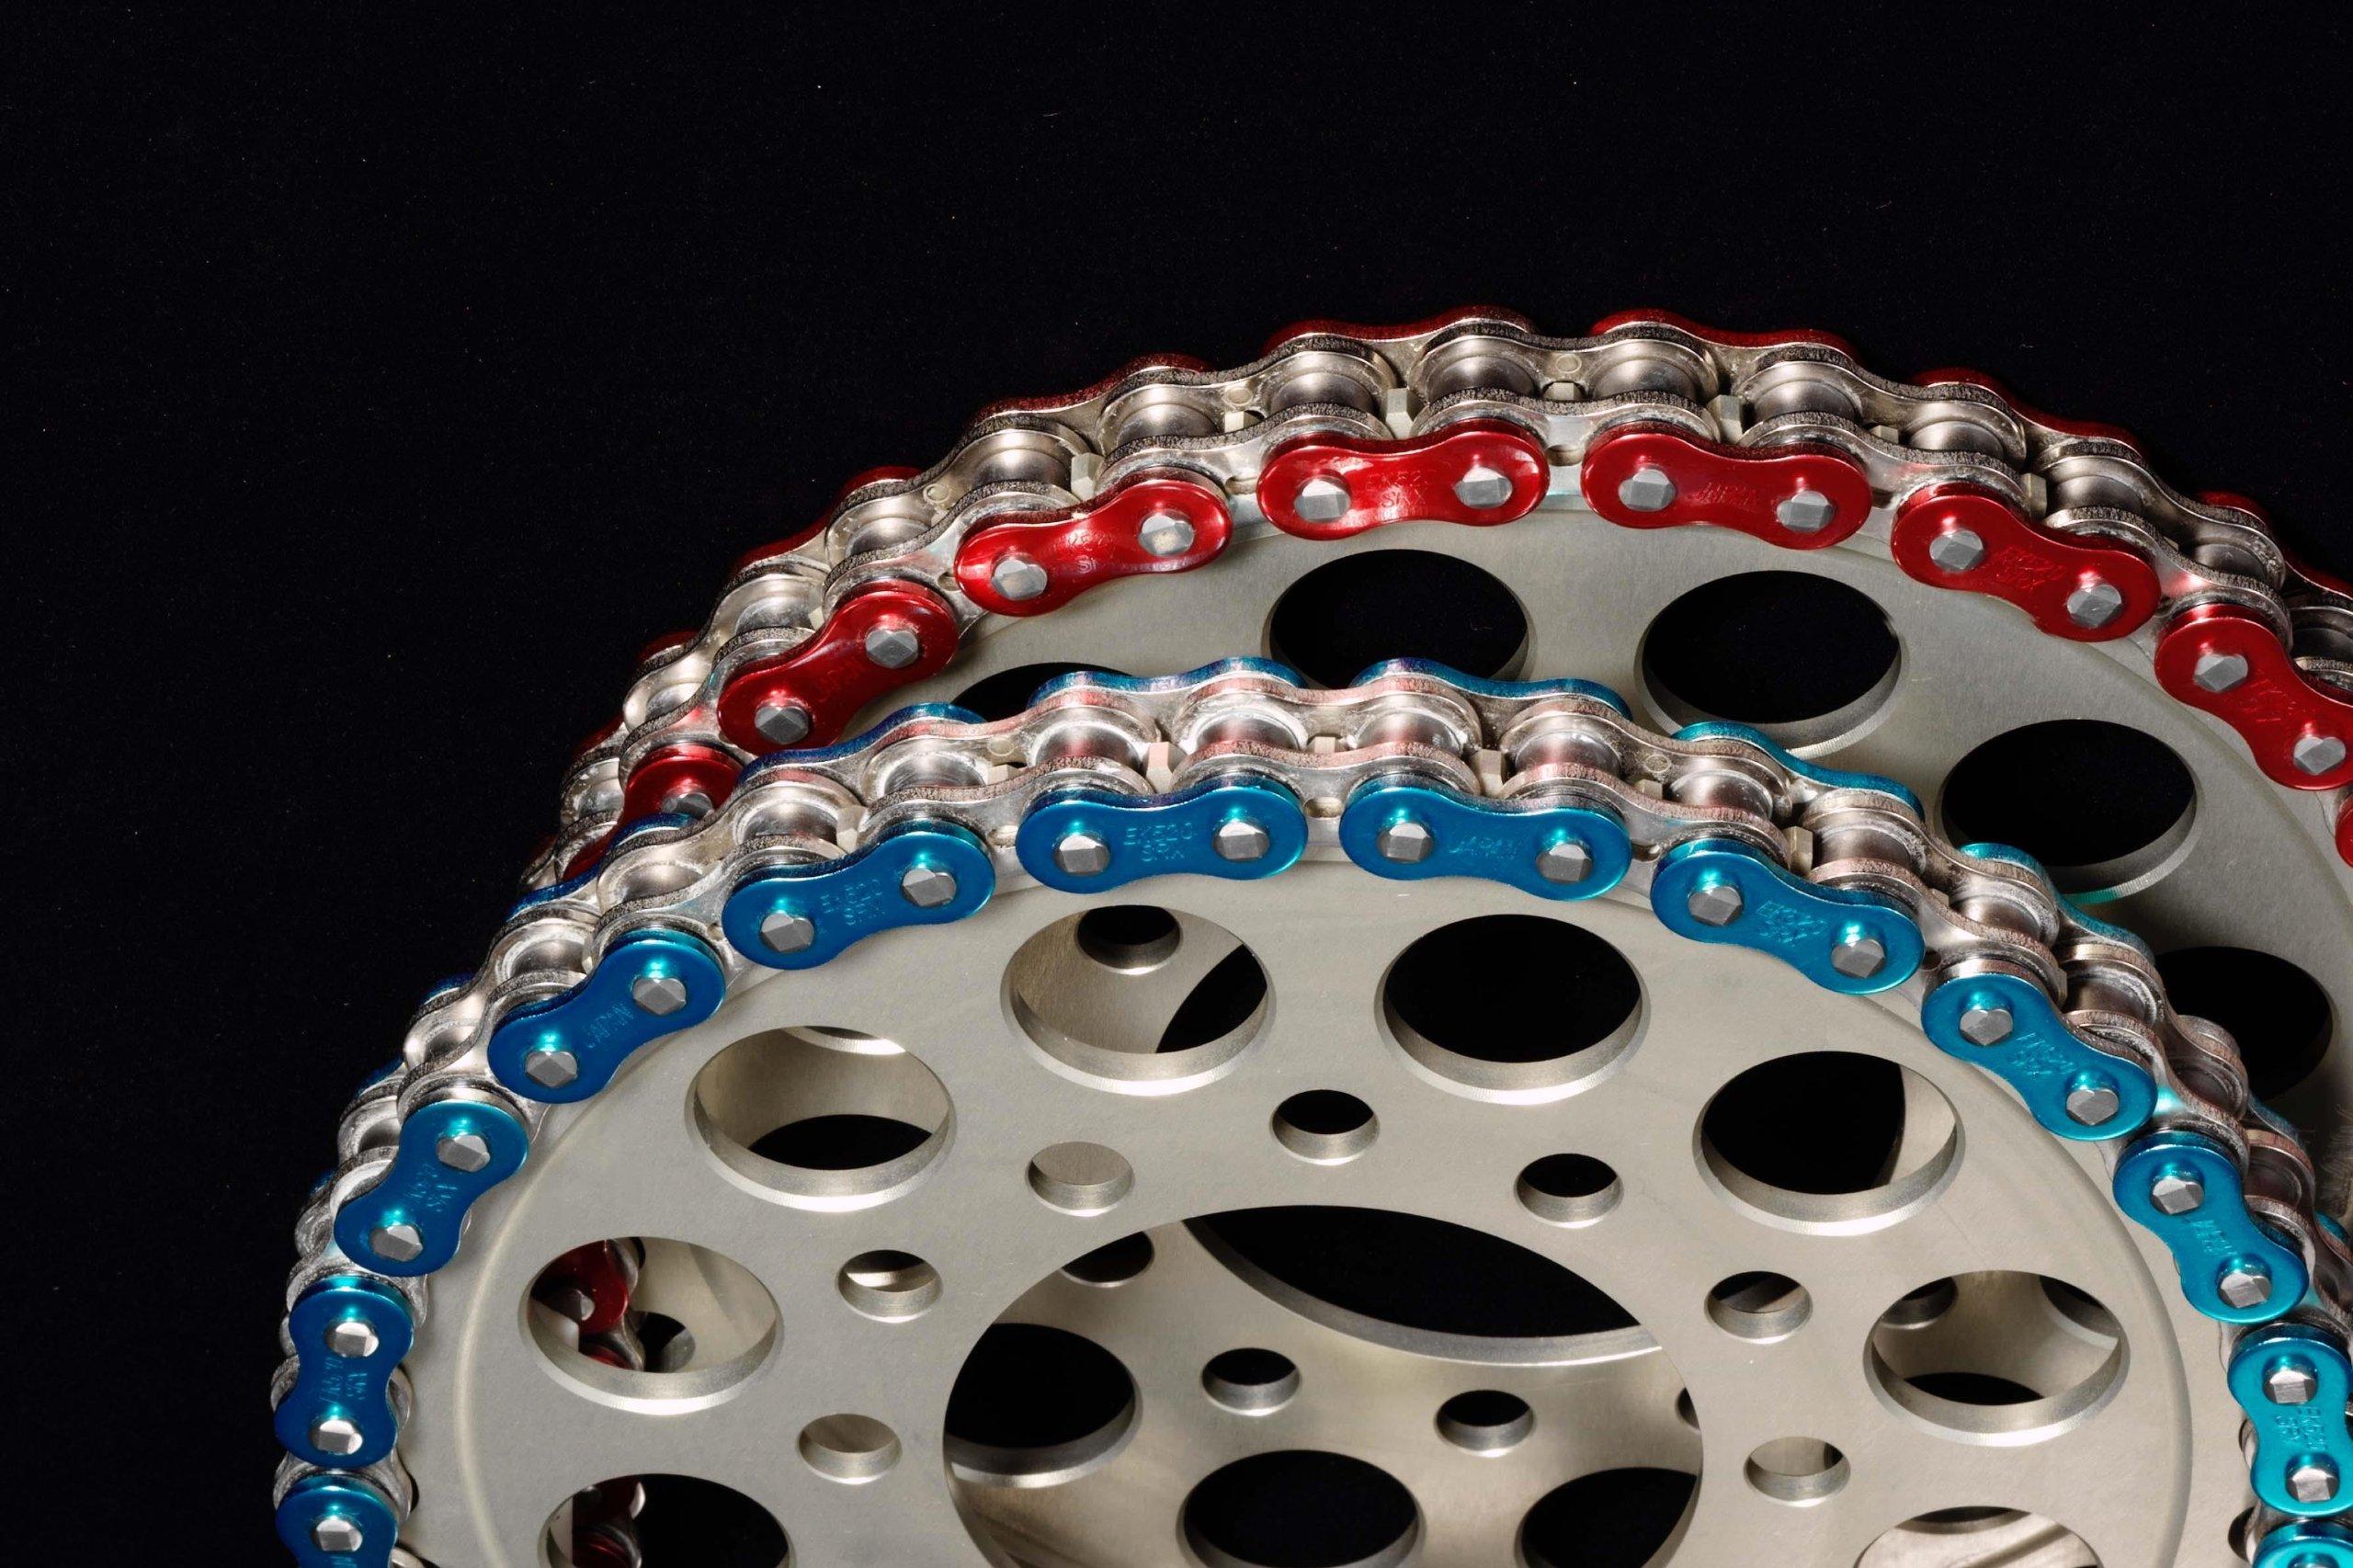 EK Chain 530 ZVX3 NX-Ring Chain - 120 Links - Metallic Blue , Chain Type: 530, Chain Length: 120, Chain Application: Street, Color: Blue EK 530ZVX3 X 120 MET BU